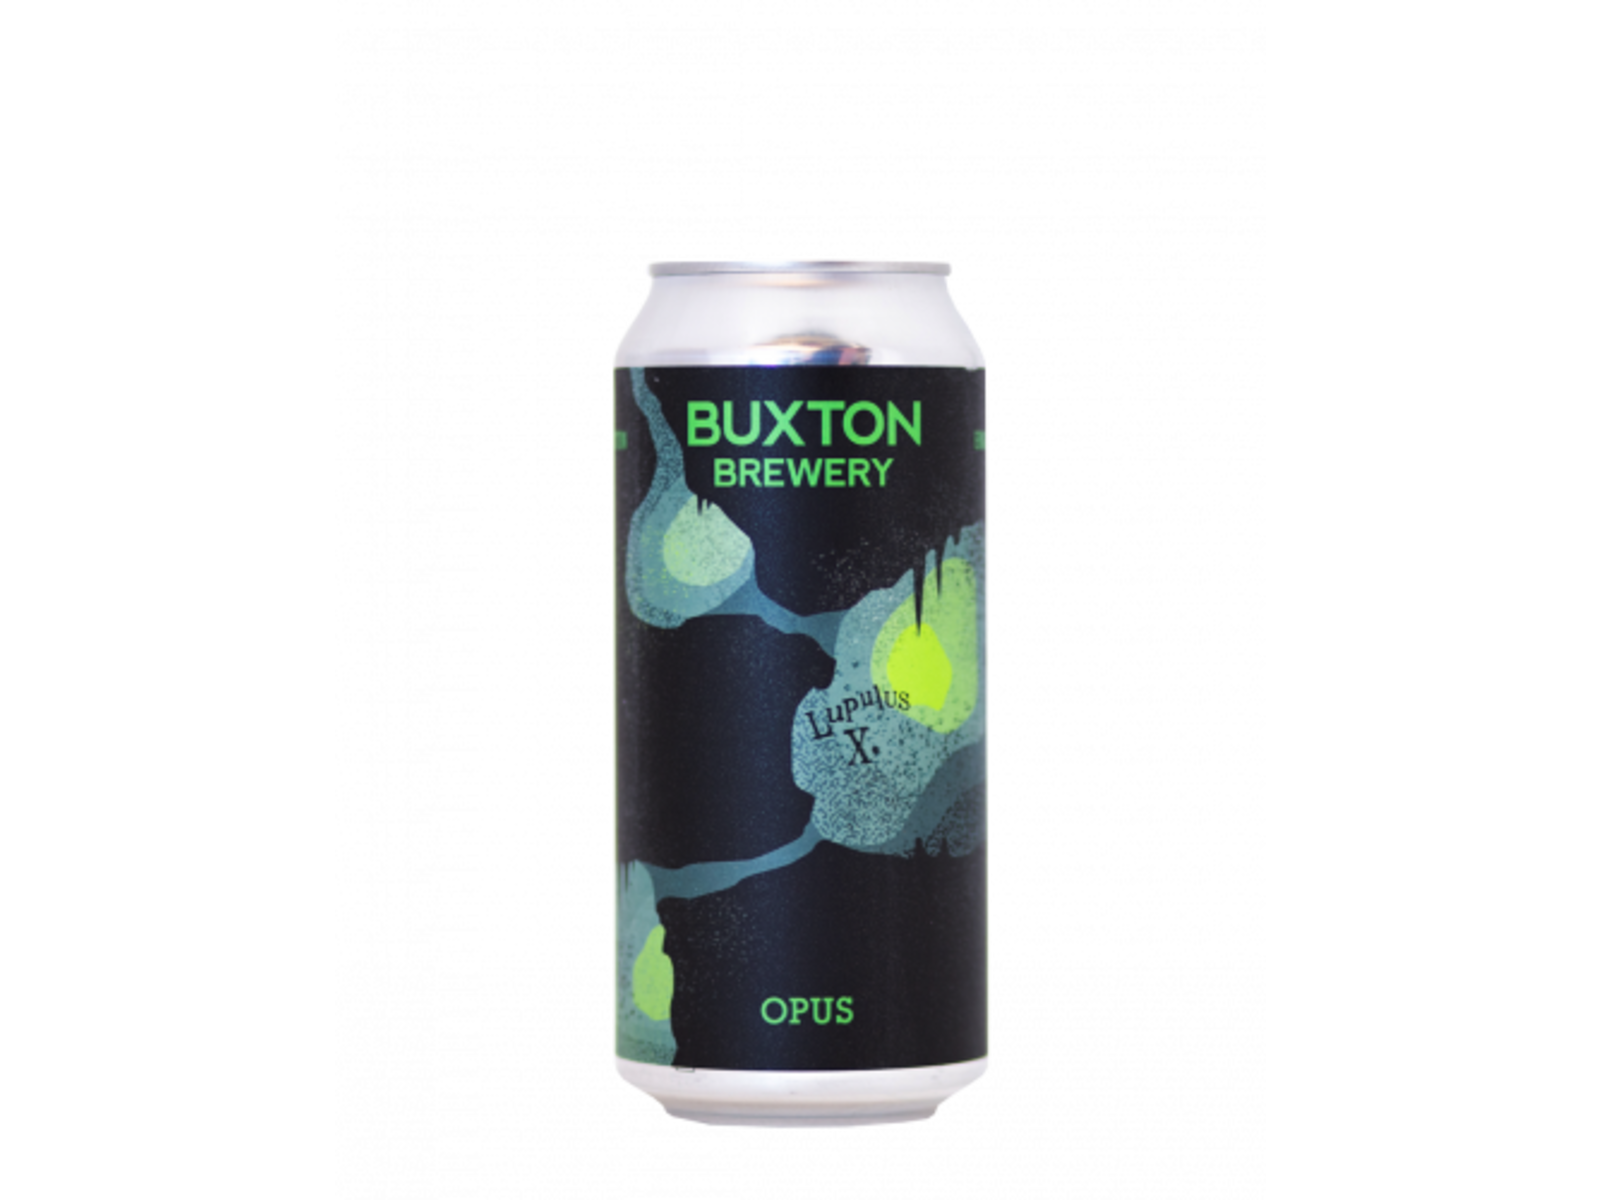 Buxton / LupulusX Opus SH IPA